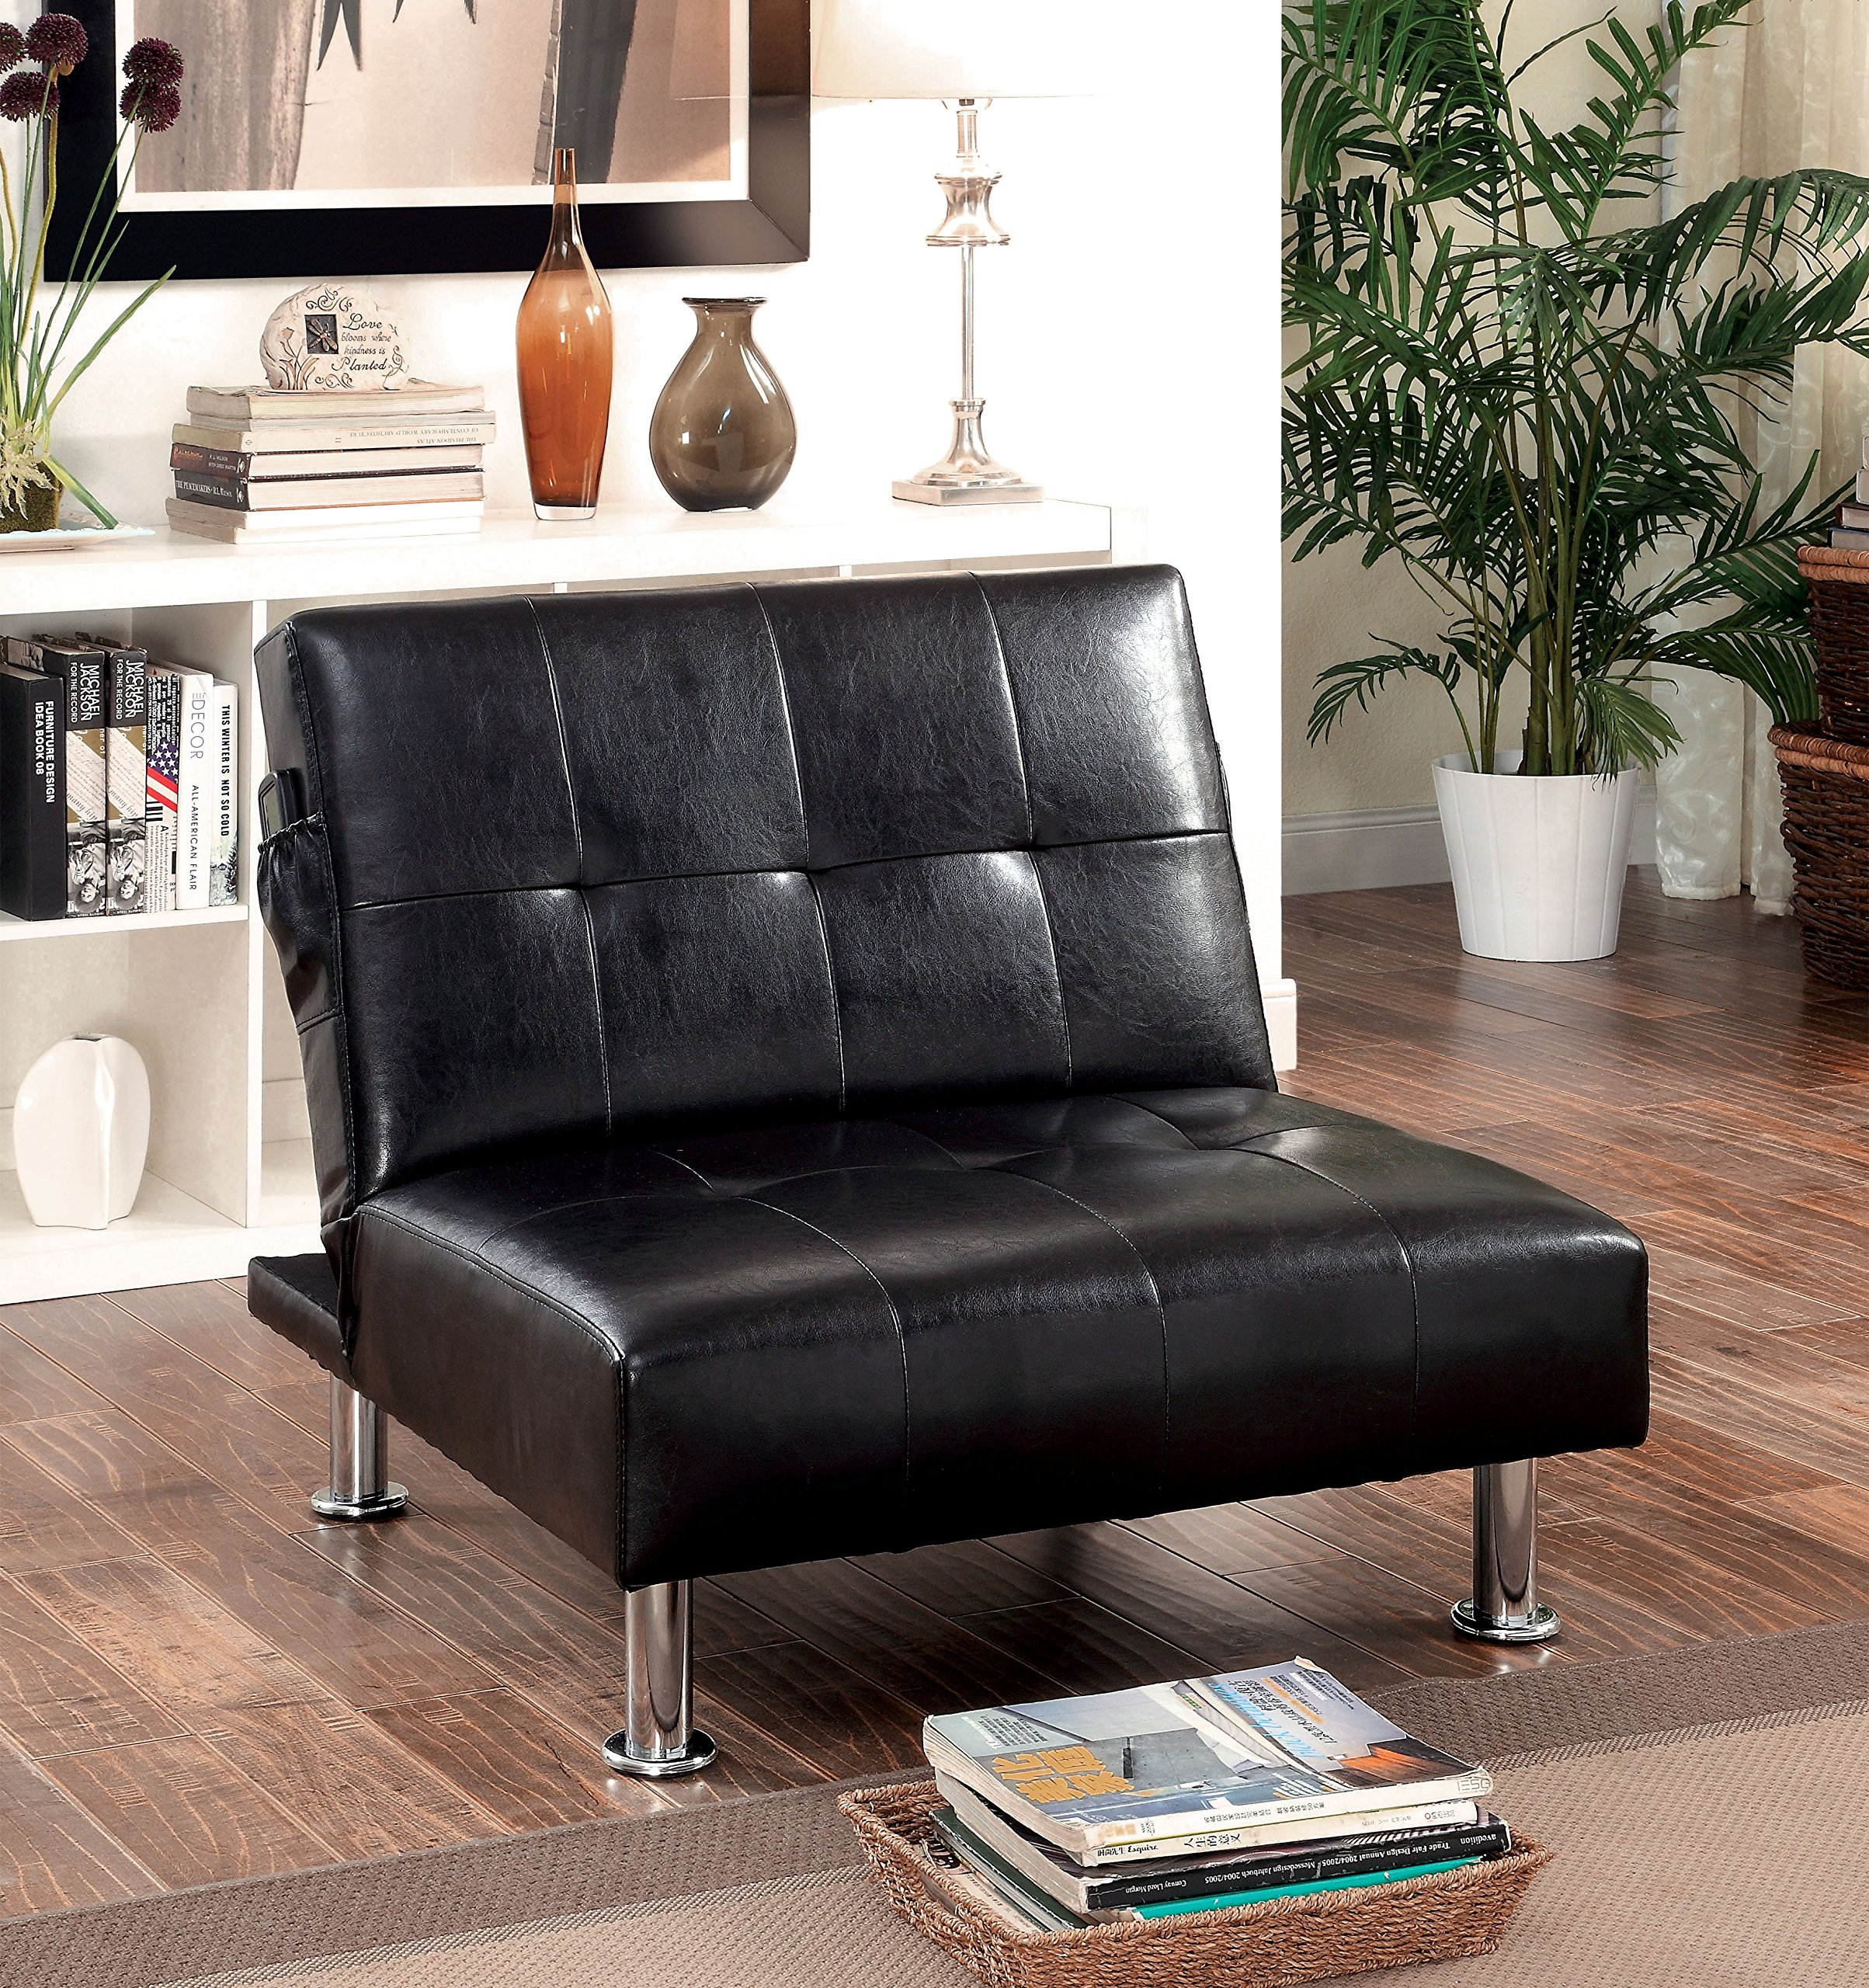 Furniture of America Pirelli Convertible Chair, Black